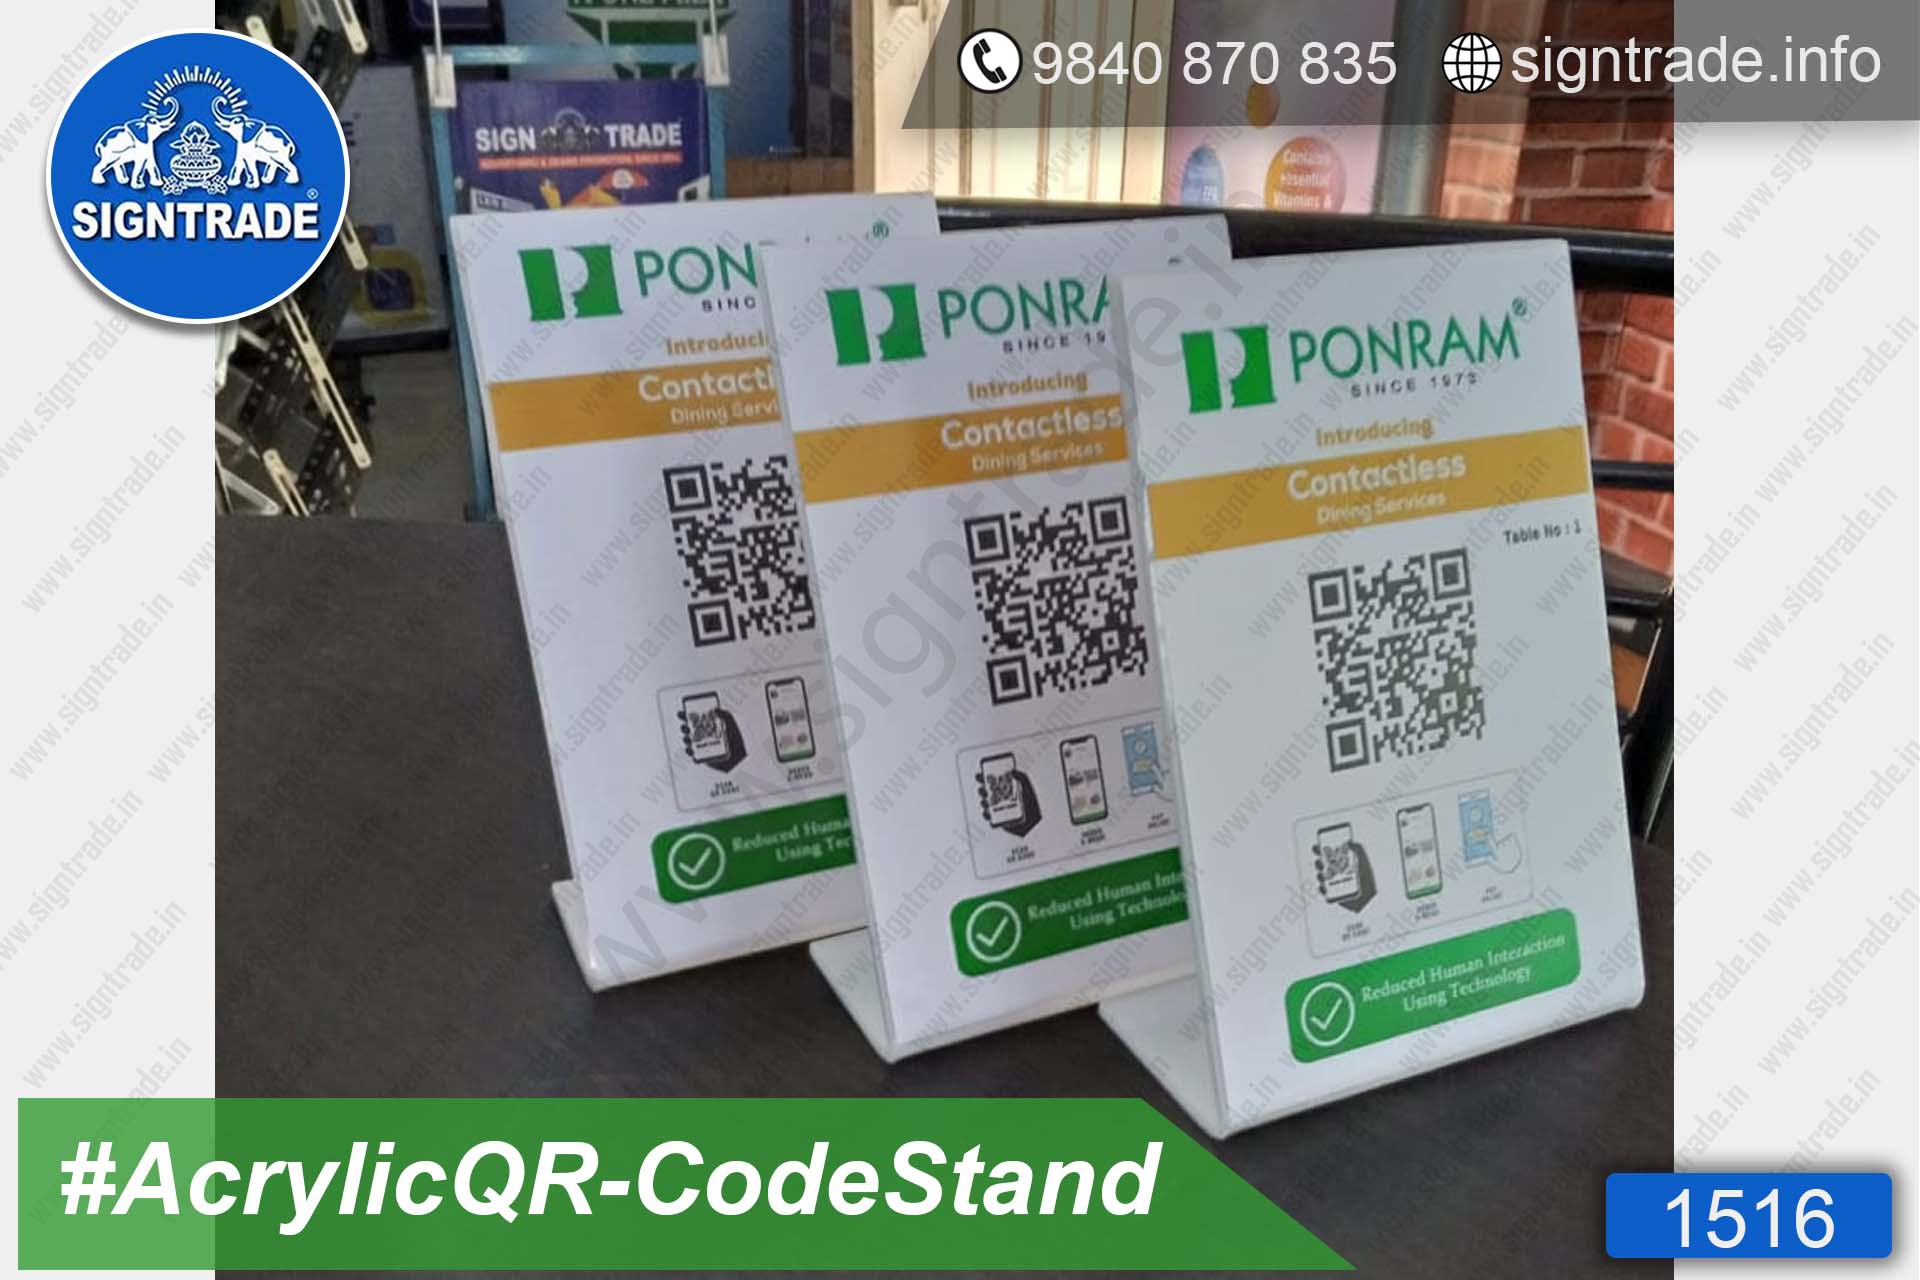 PONRAM Hotel, Dindigul - SIGNTRADE - Acrylic QR Code Stand Manufacturer, Wholesaler in Chennai